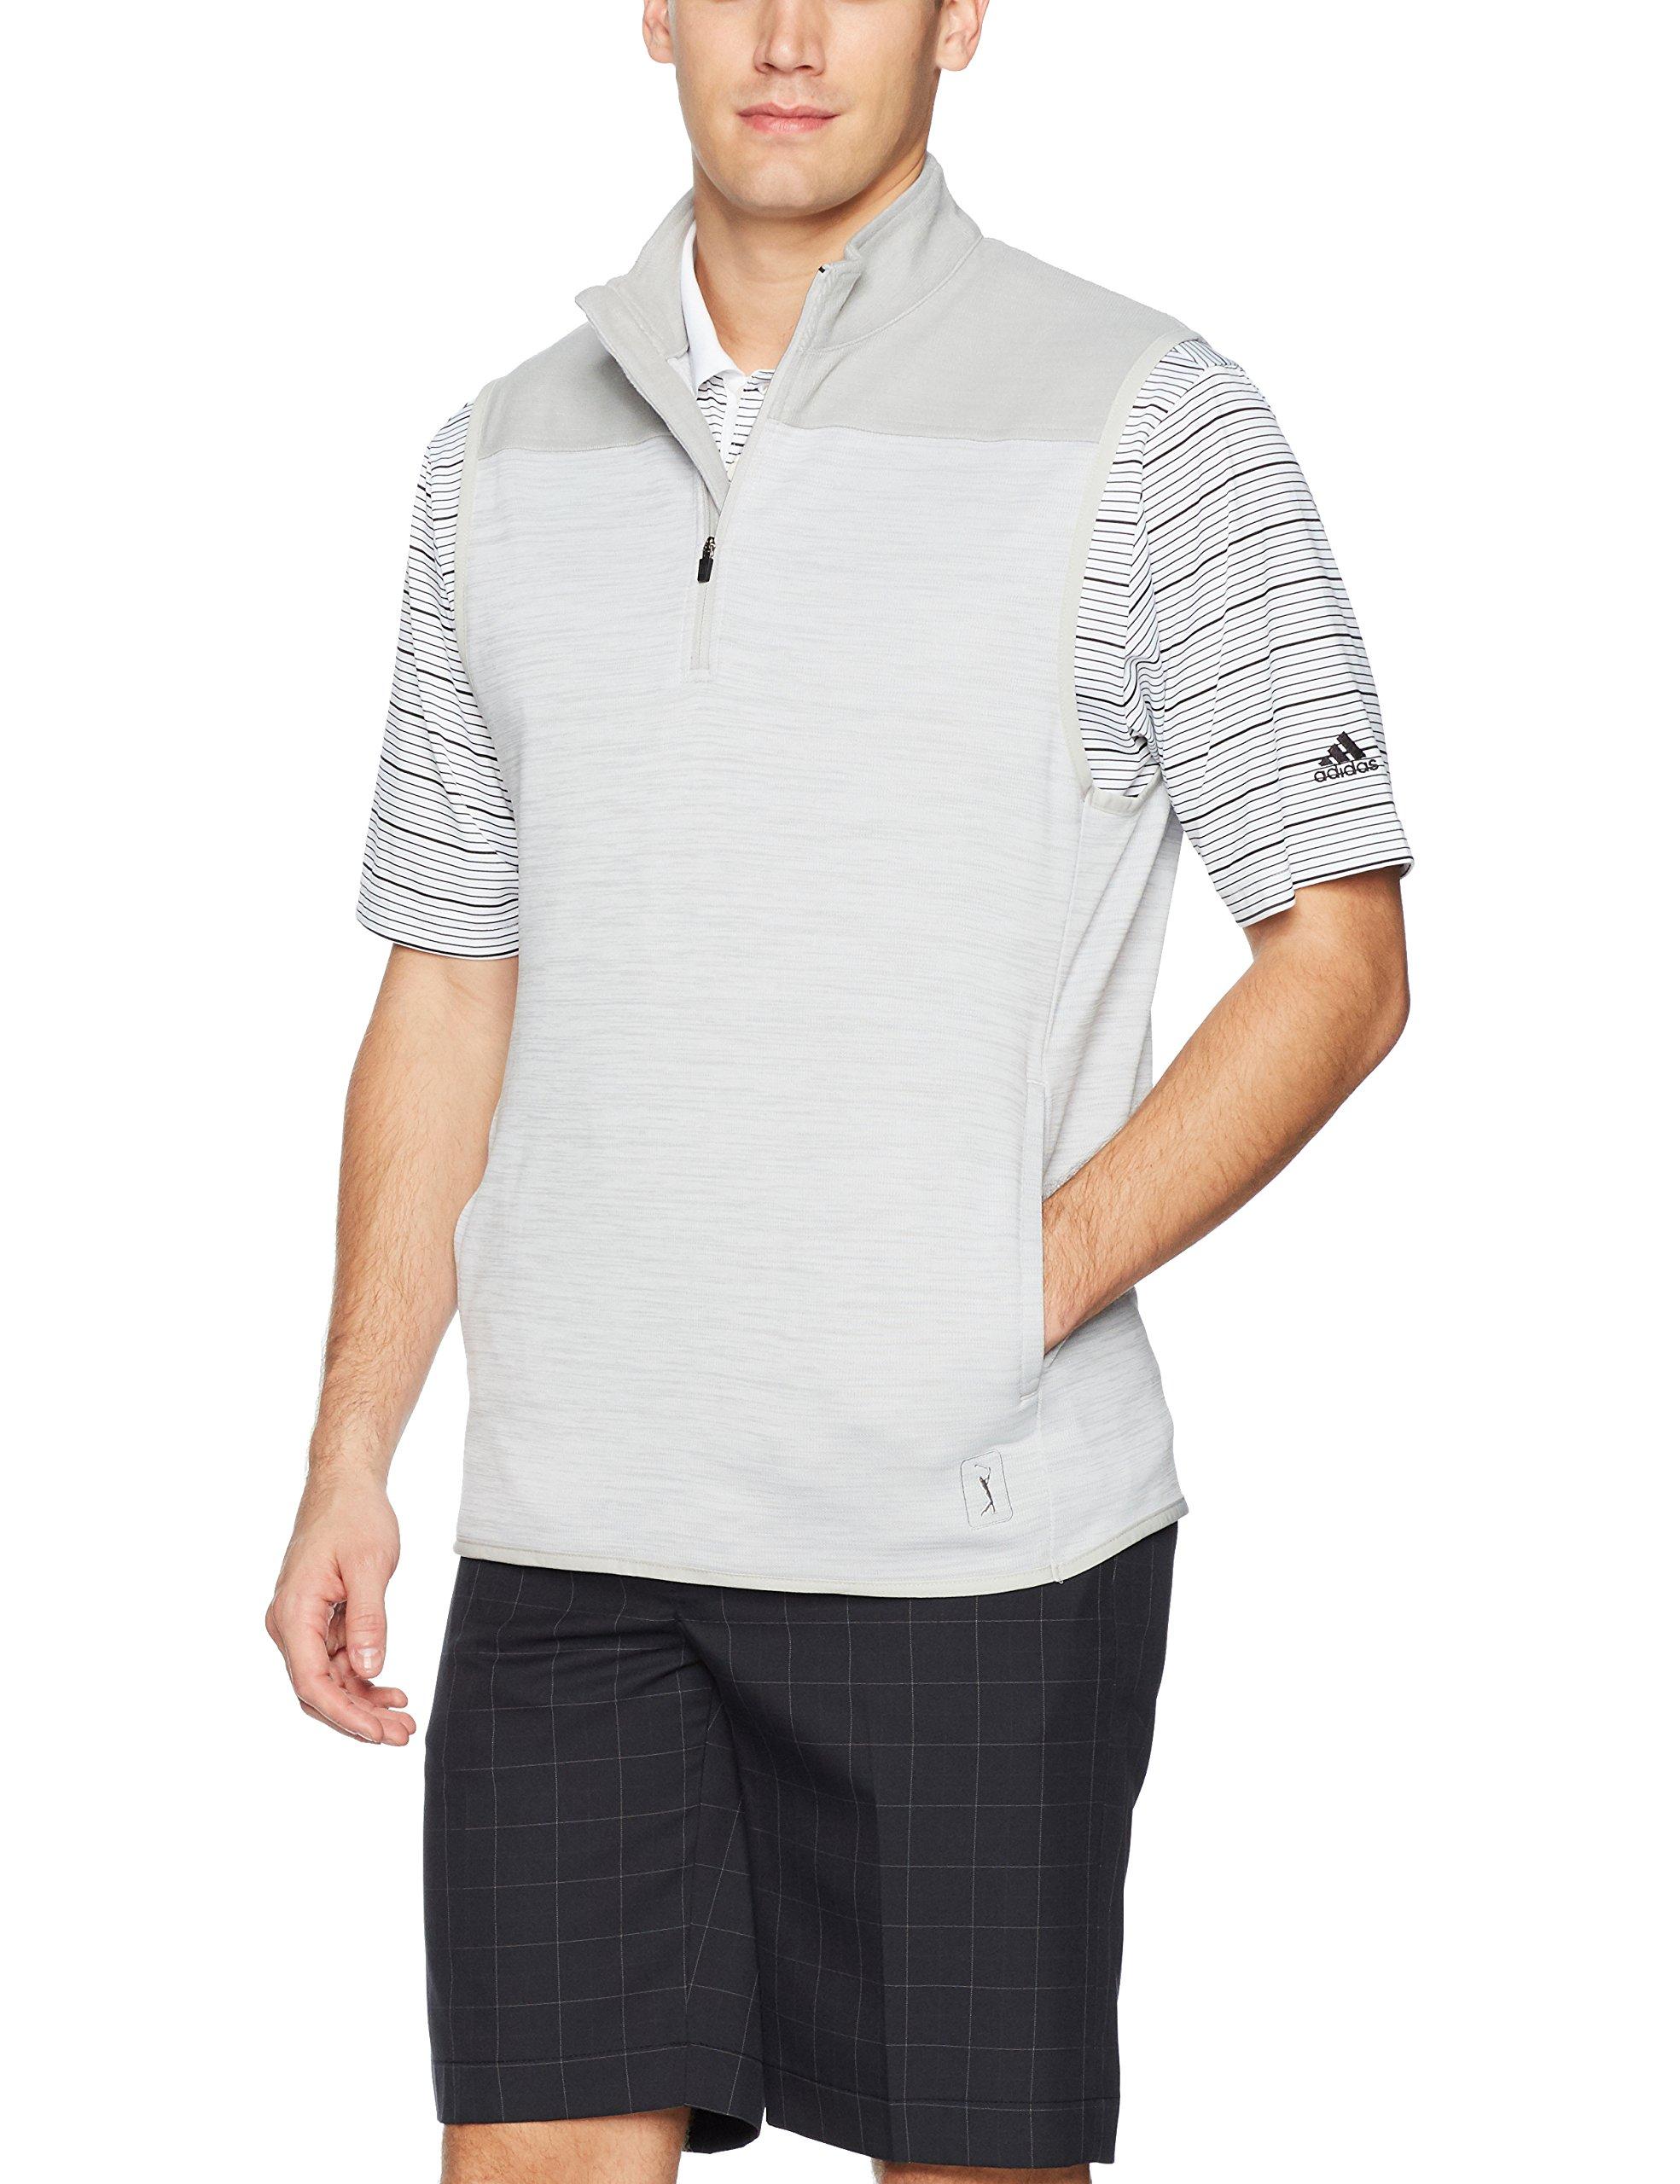 PGA TOUR Men's Elements Sleeveless 1/4 Zip Vests, High Rise Heather_PVKF70G3, XL by PGA TOUR